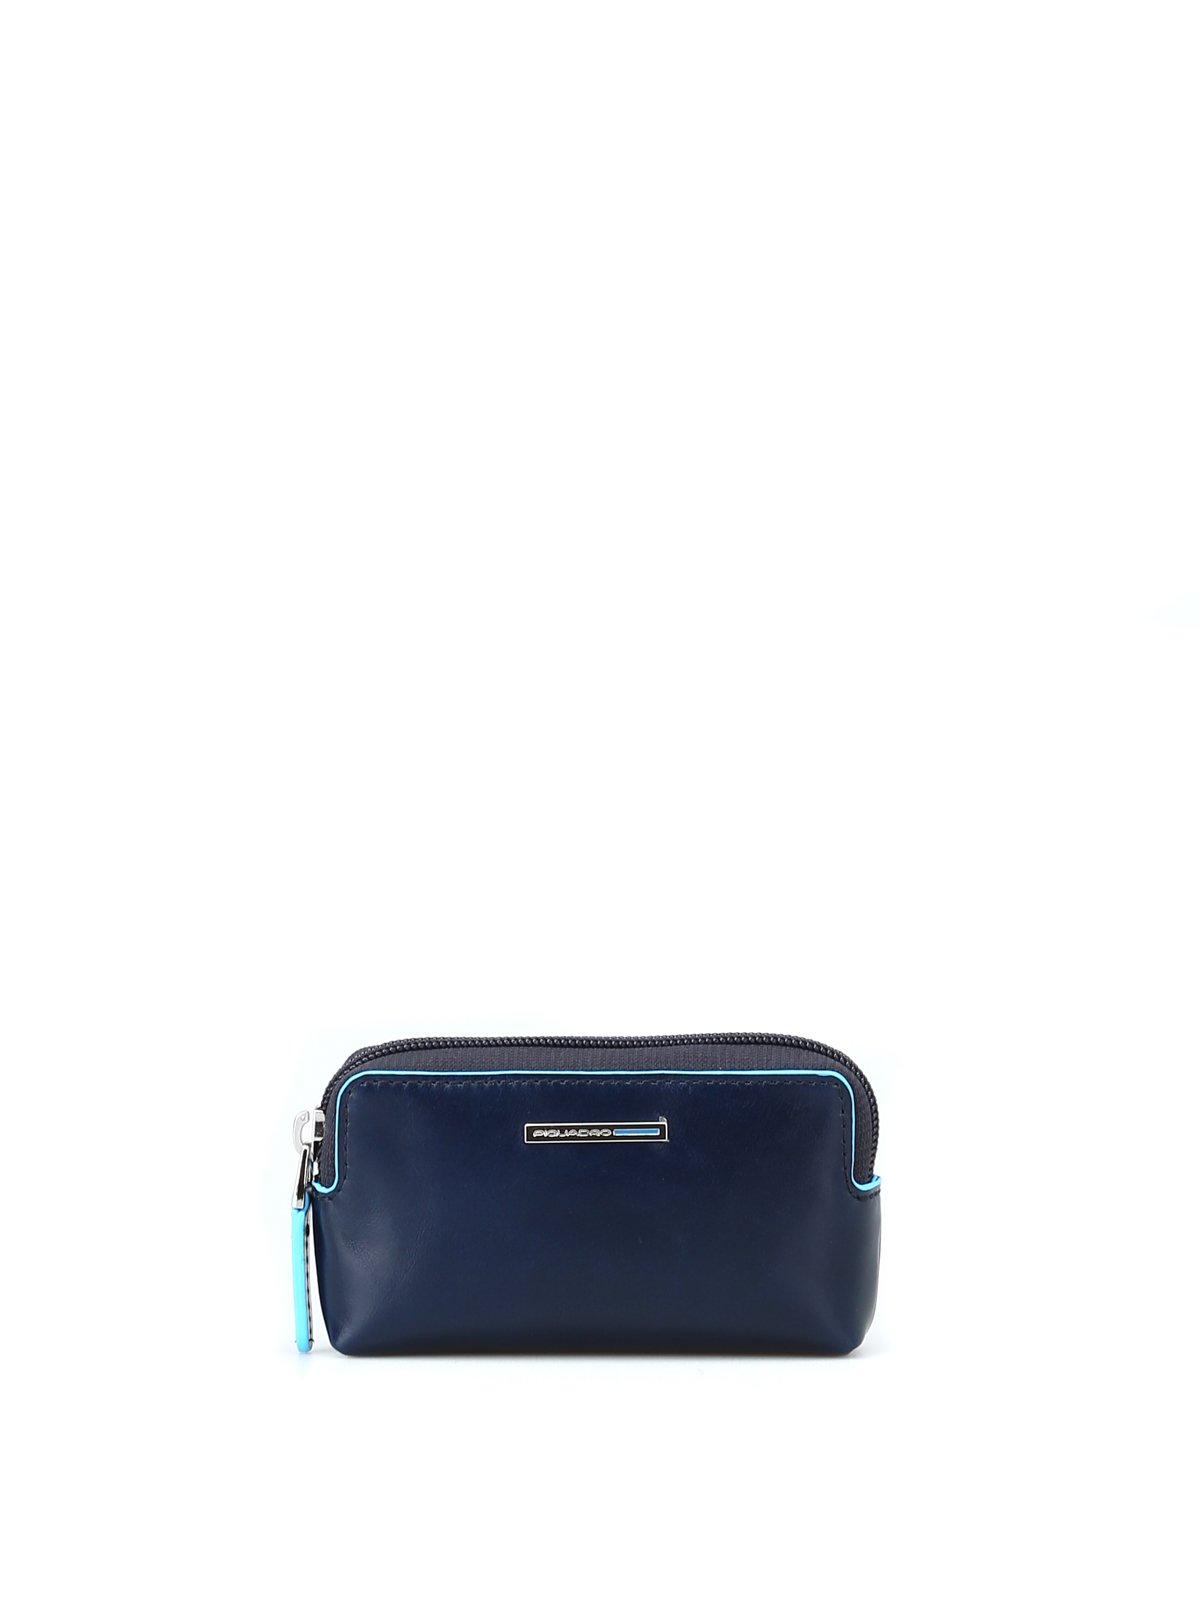 Piquadro Blue Square Leather Key Pouch